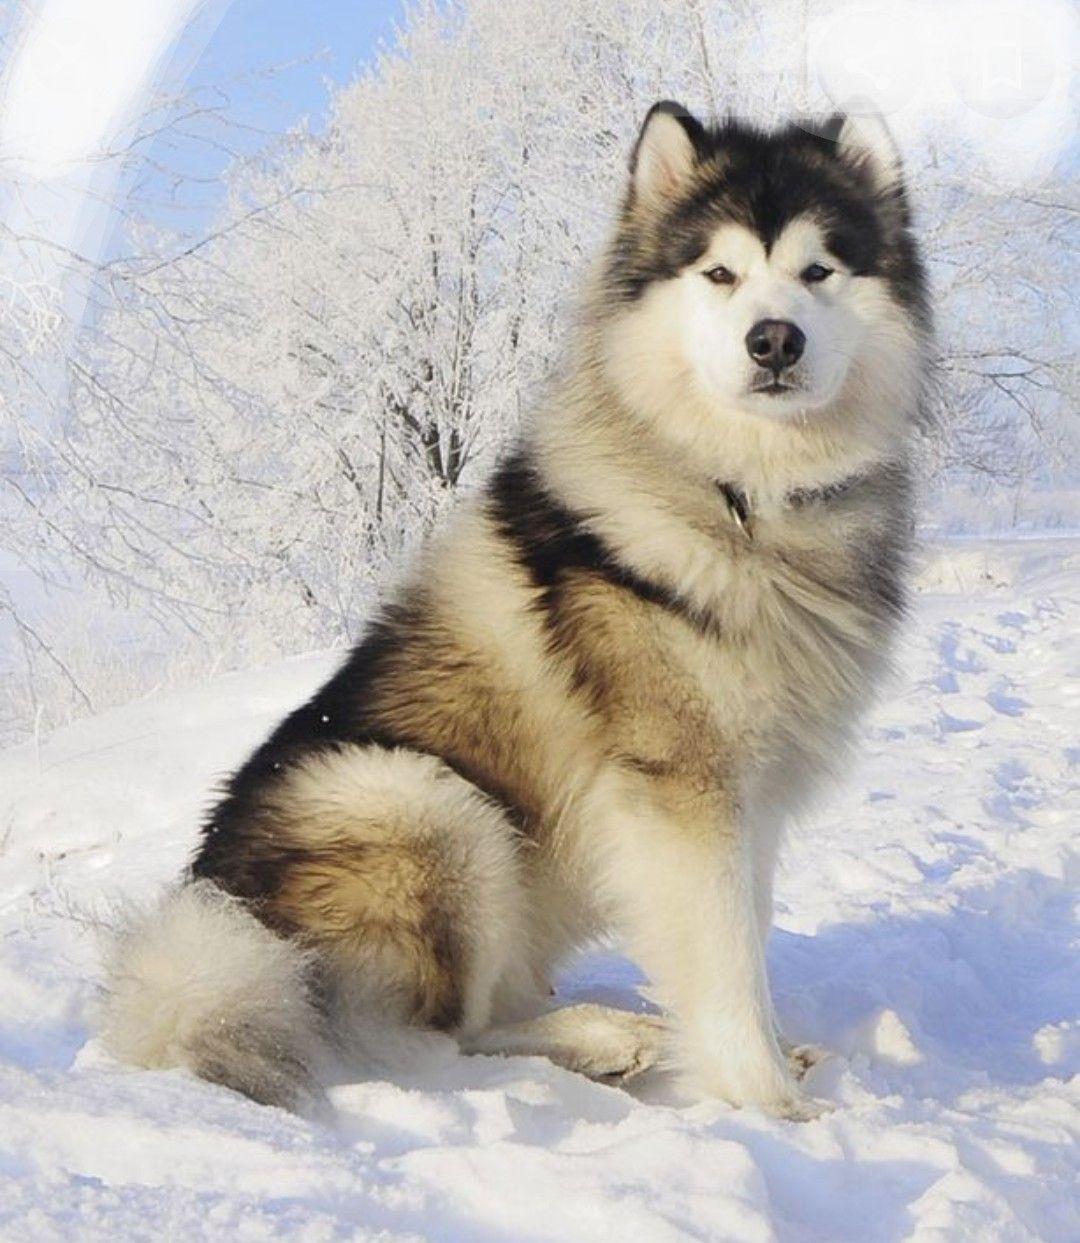 Pin By Taashvi Singh On My Saves In 2020 Alaskan Dog Dog Breeds Malamute Dog